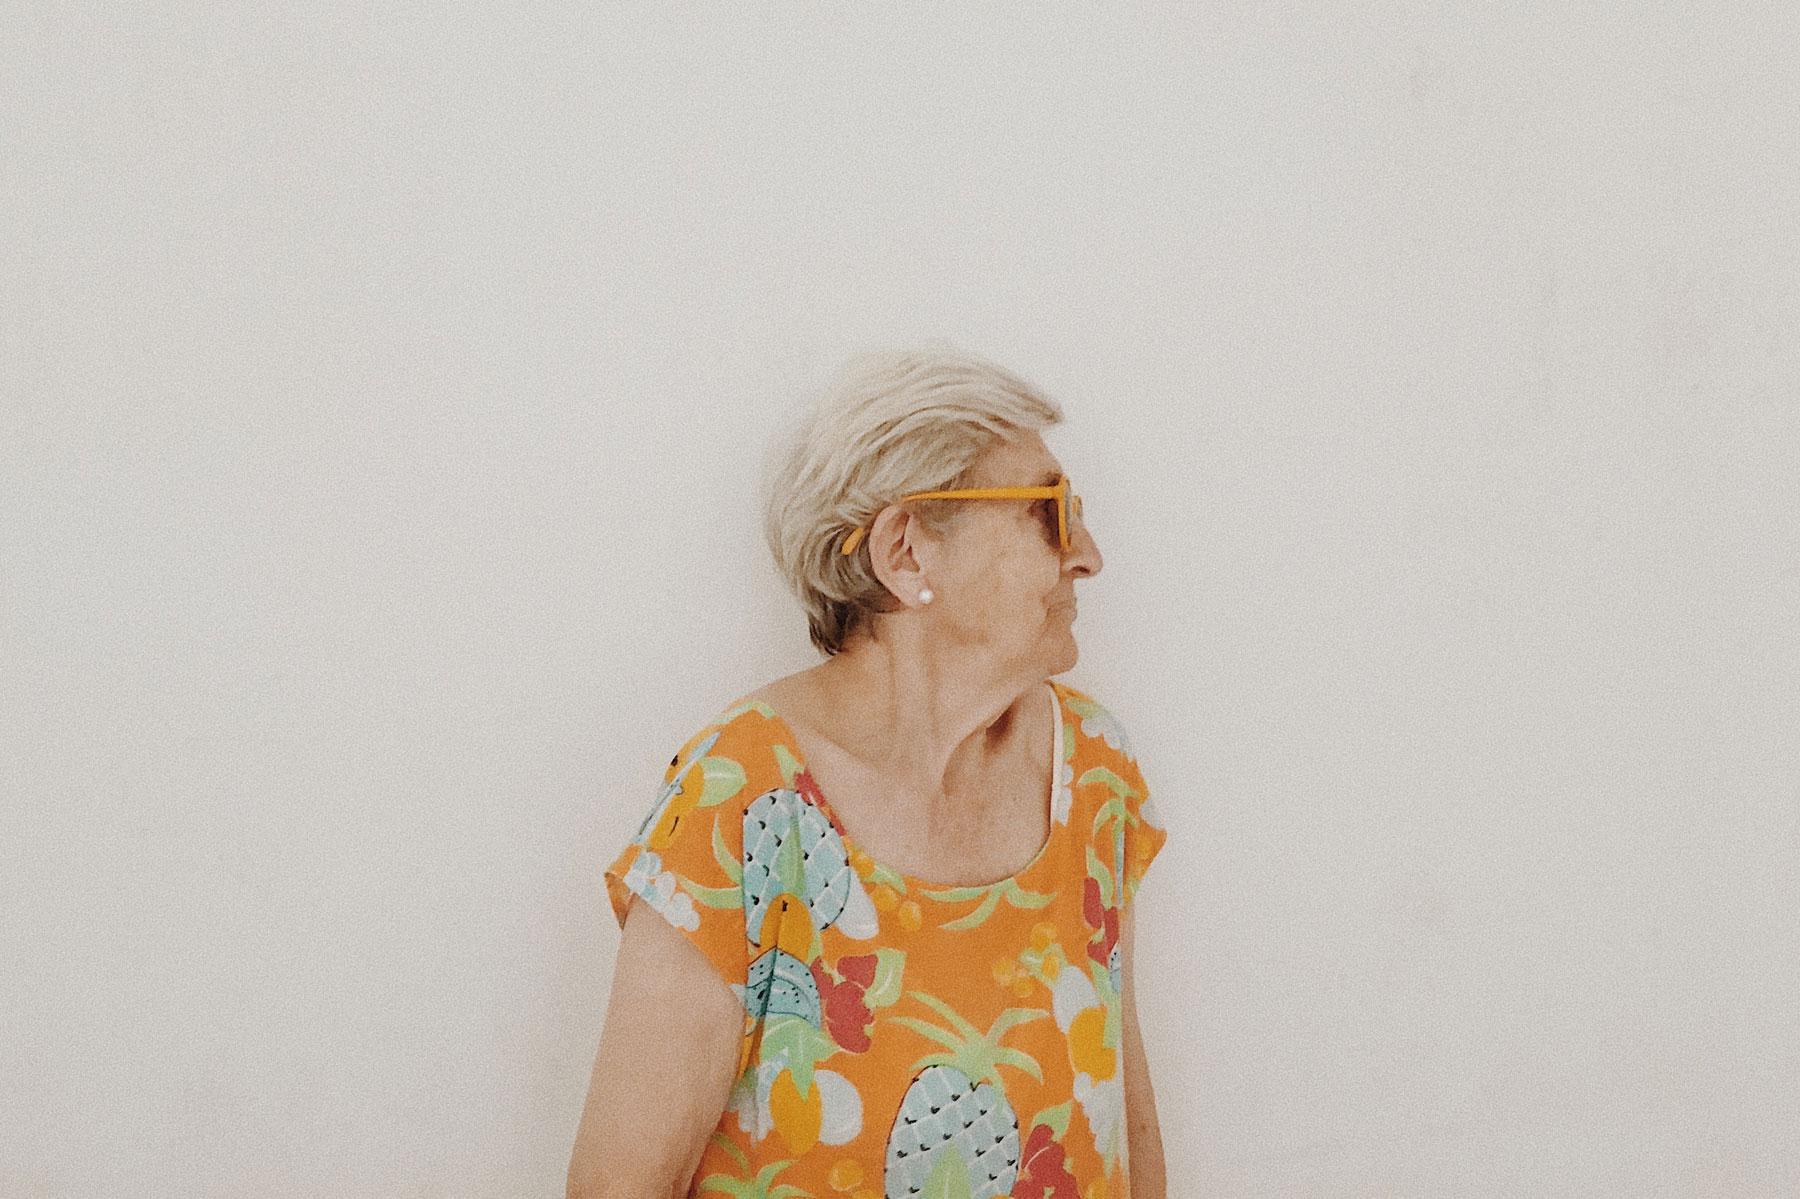 modelo abuela gafas sol diseño